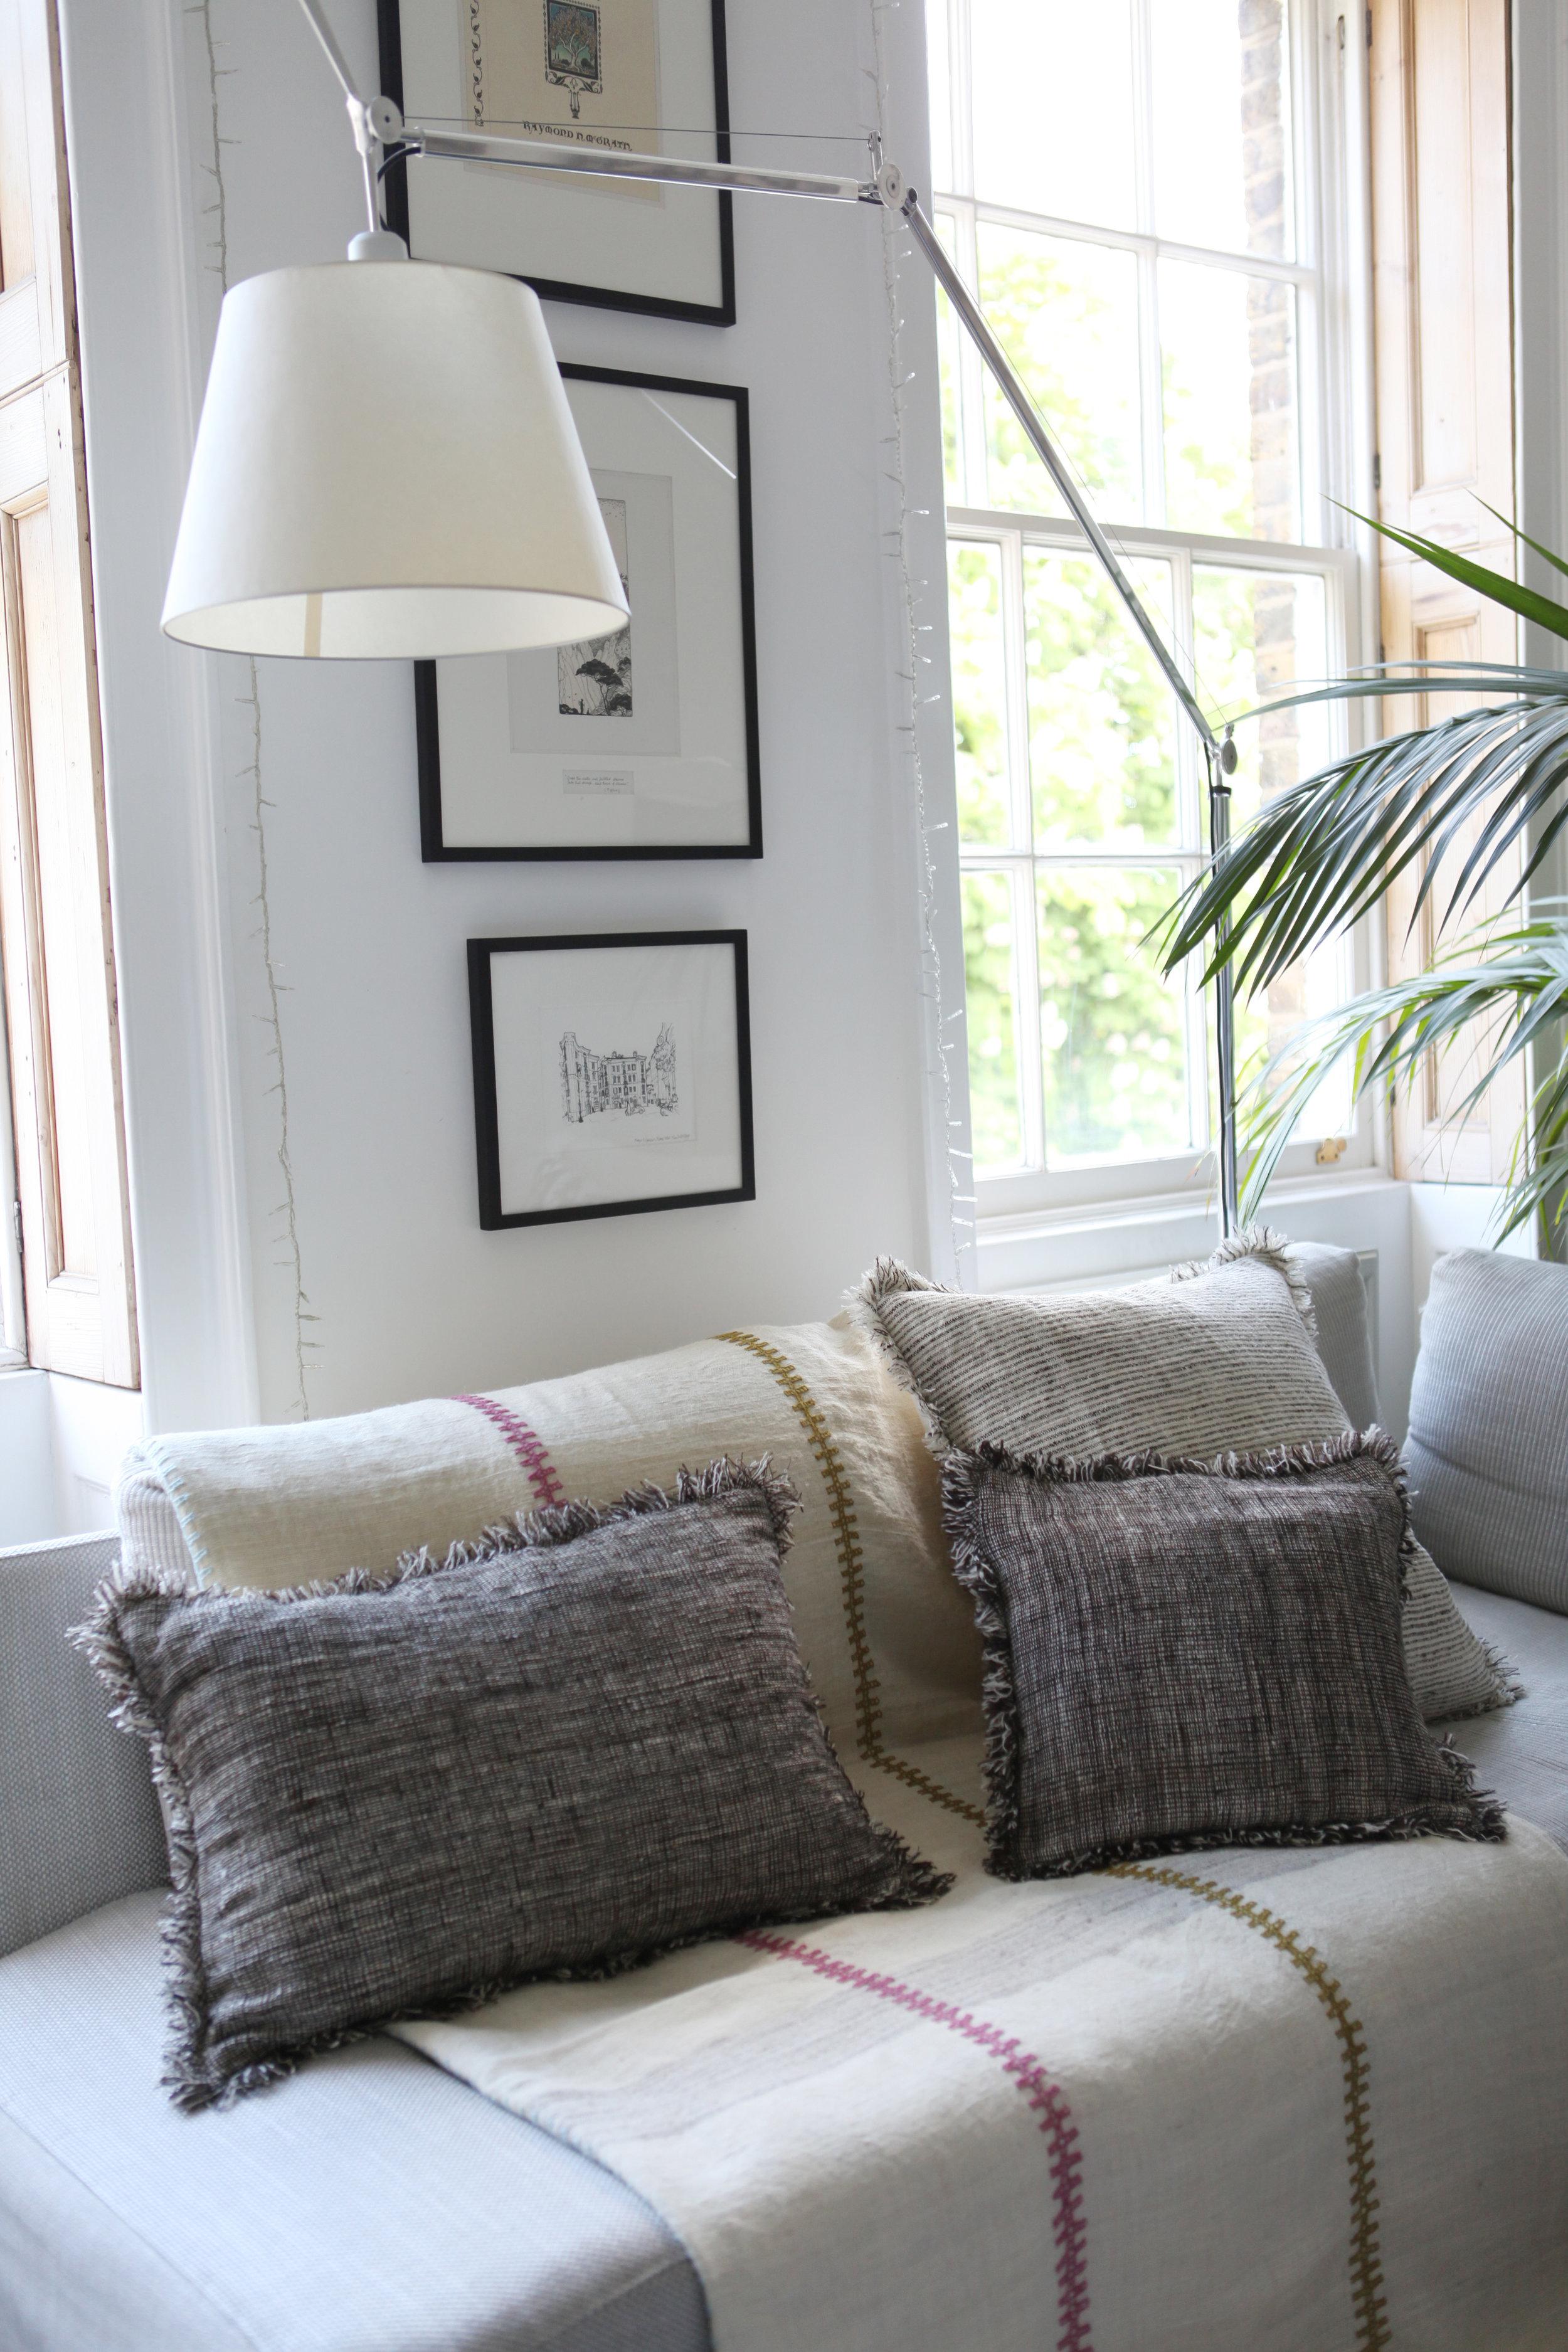 StitchByStitch_handwoven_handspun_desi_wool_cushions_desi_wool_embroidered_throw